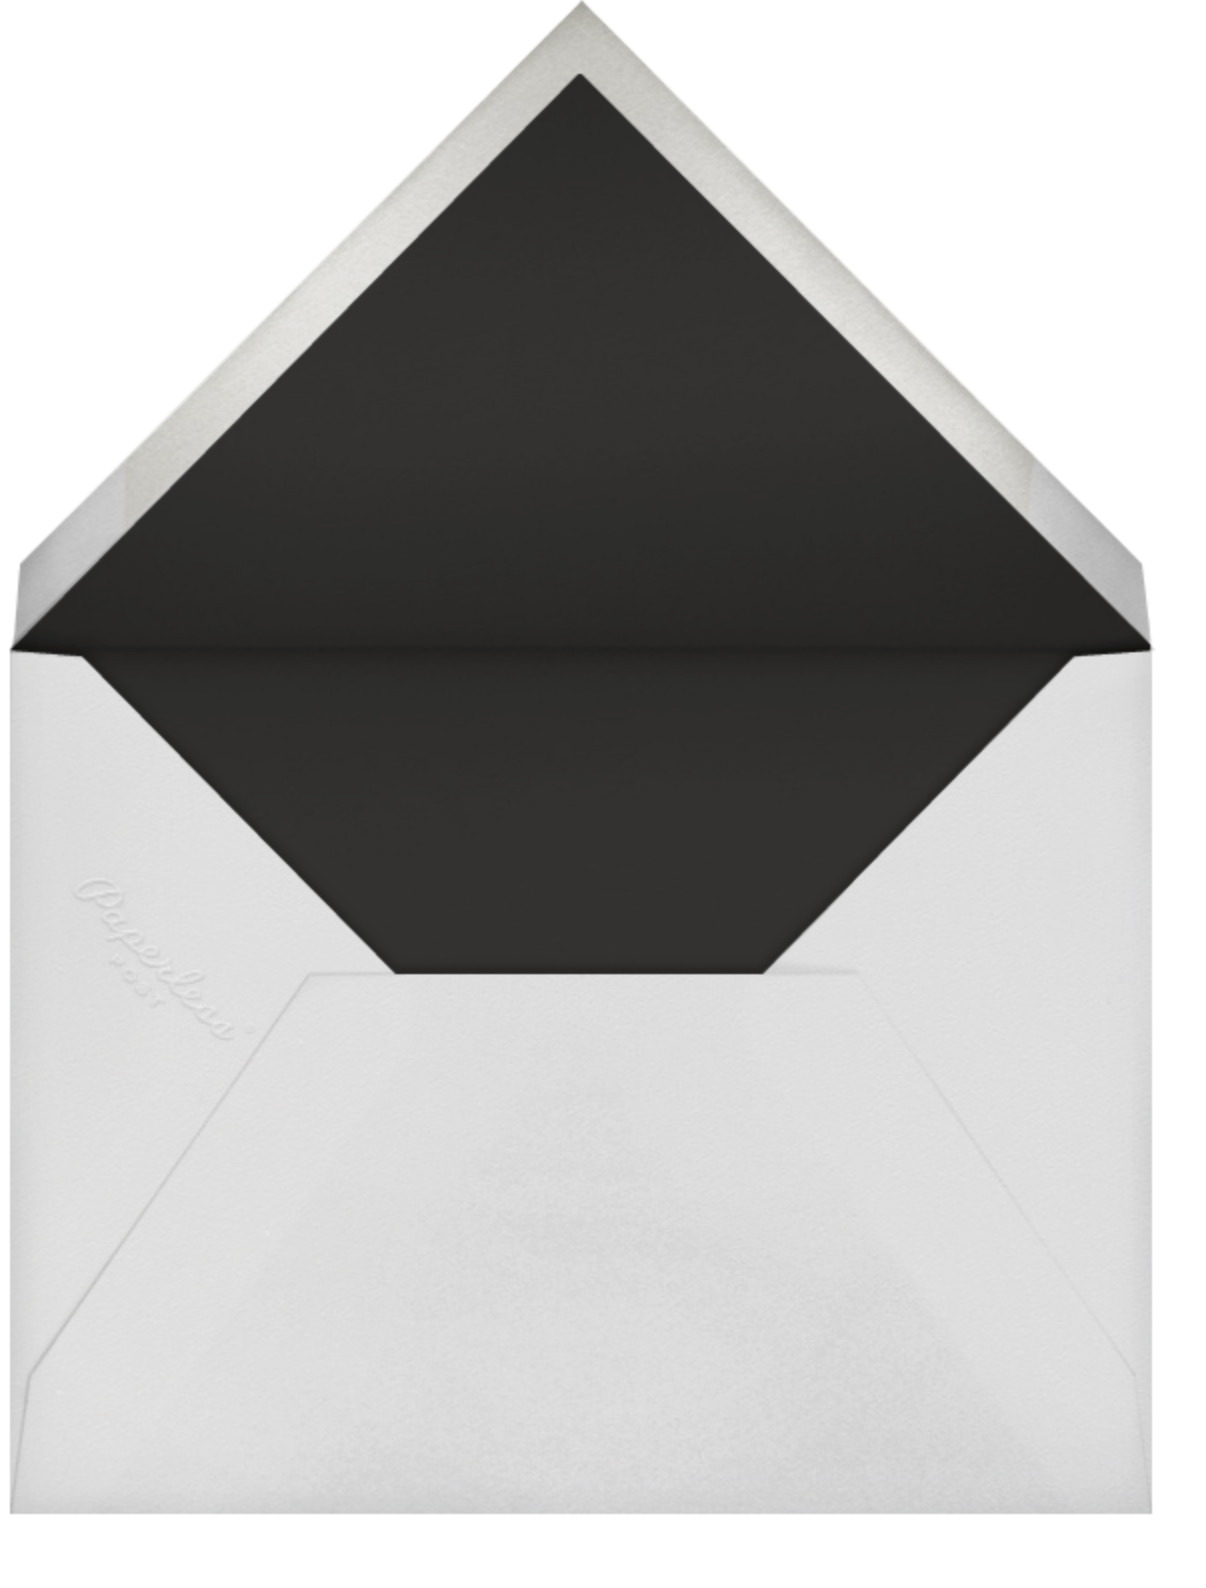 Richmond Park (Stationery) - Navy/Gold - Oscar de la Renta - Wedding - envelope back